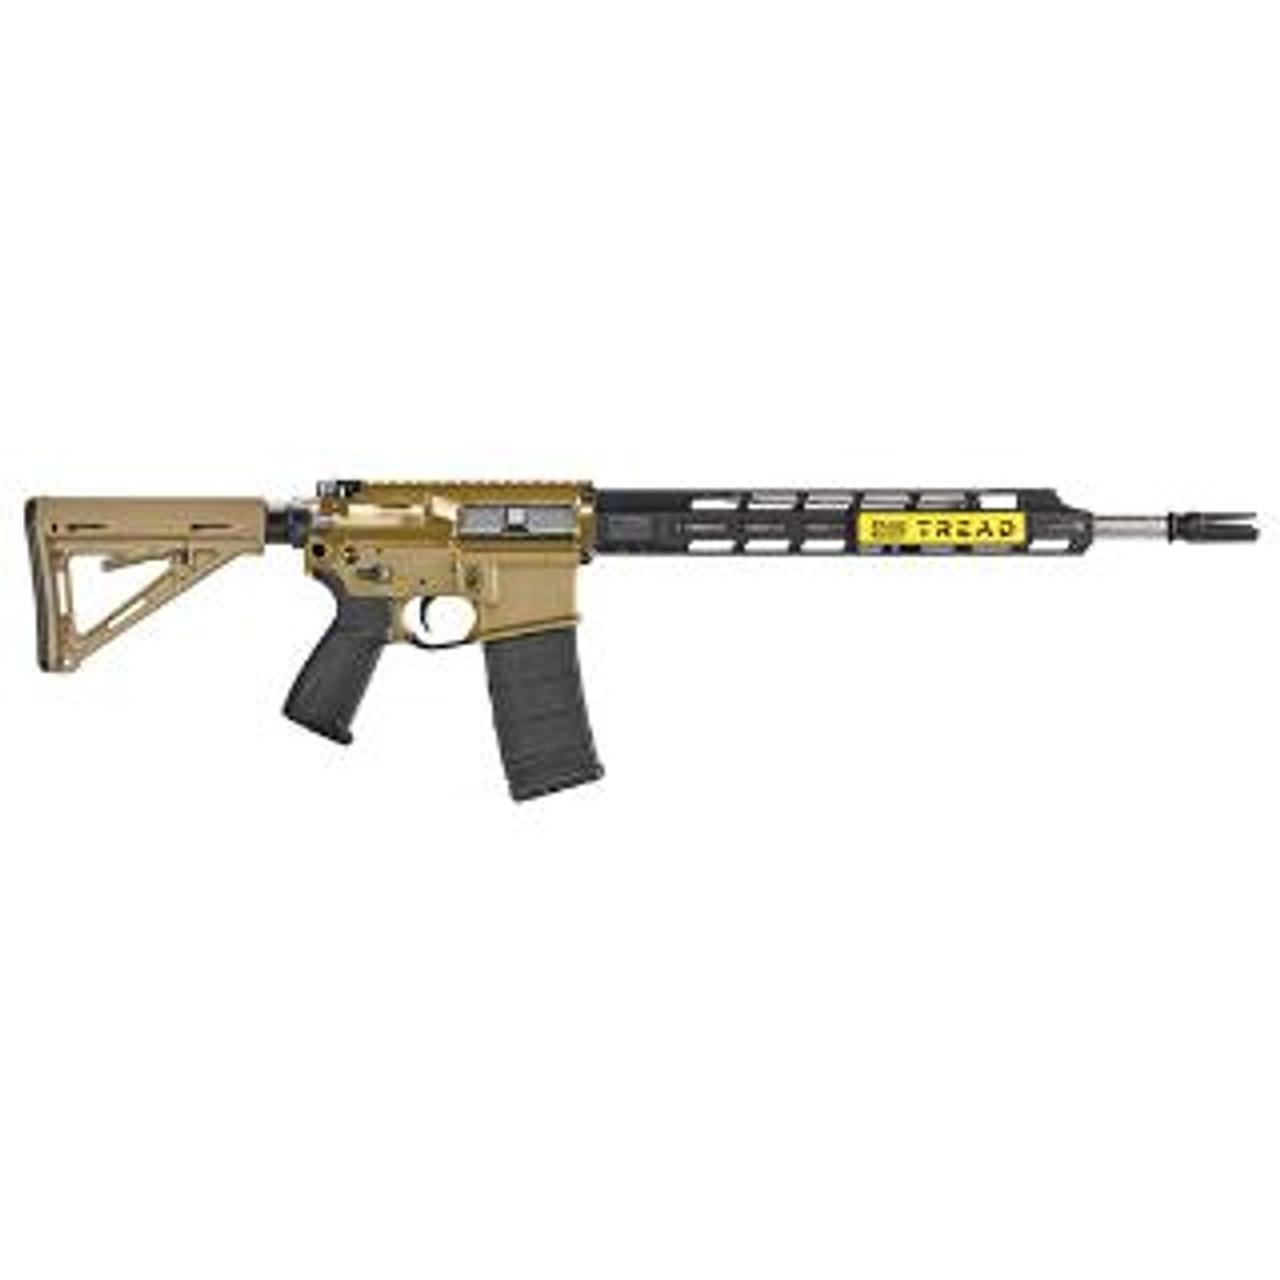 Sig Sauer M400 Tread Snake Bite CALIFORNIA LEGAL - .233/5.56 - FDE